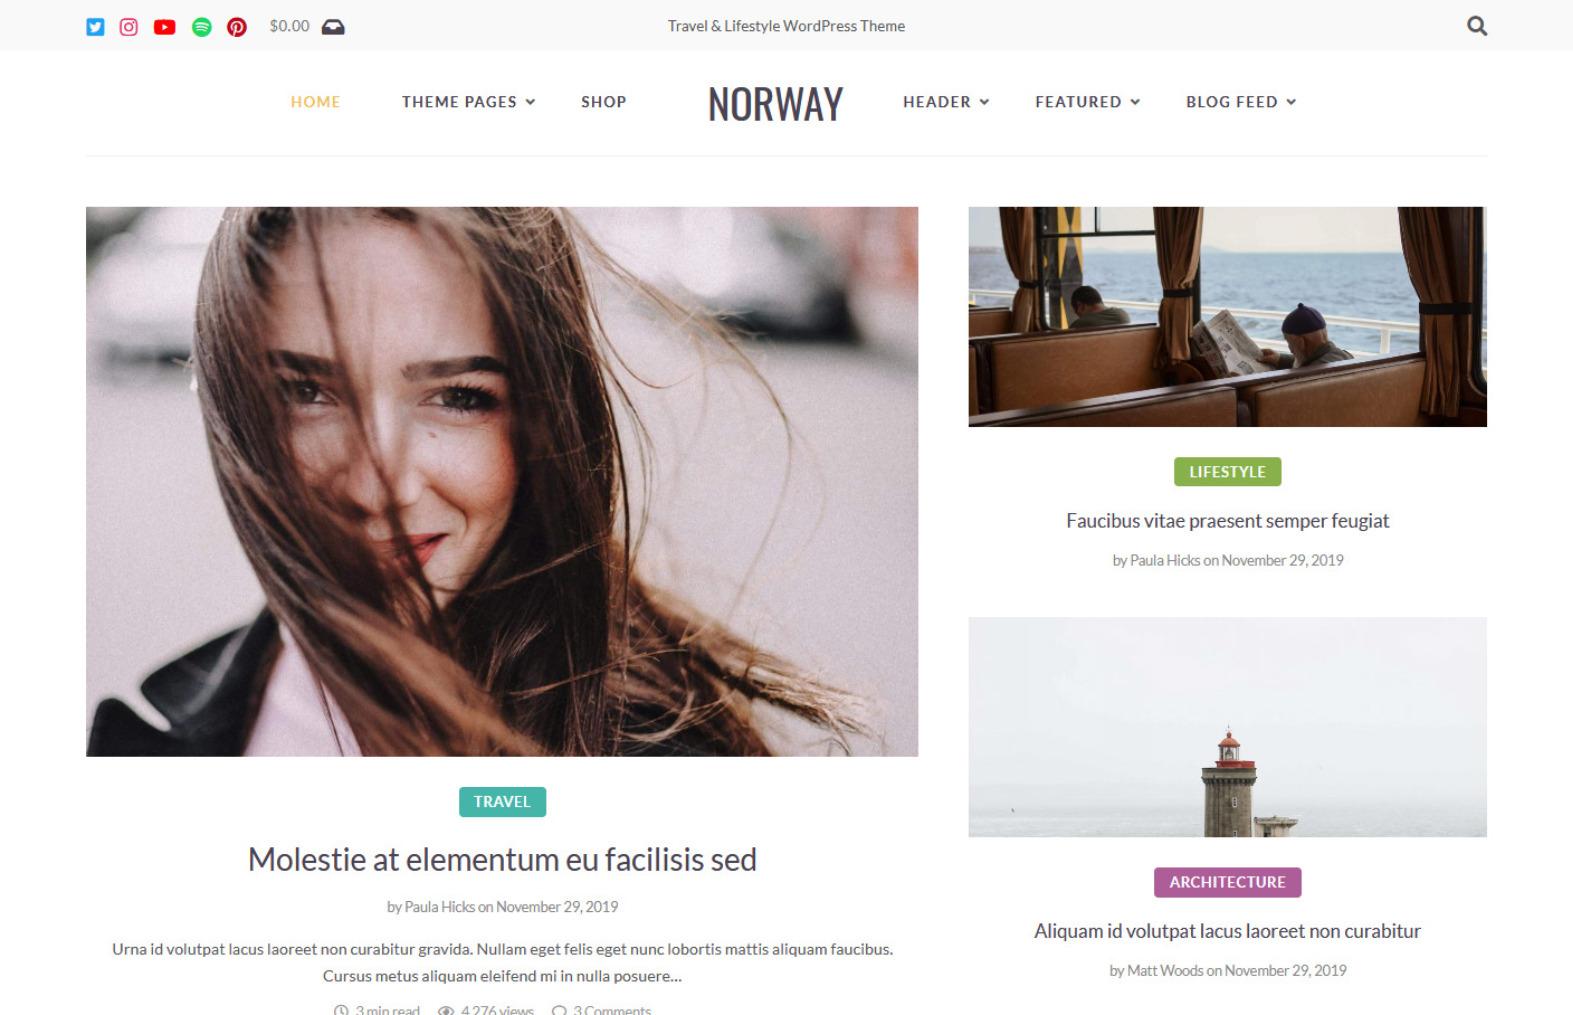 Norway Contemporary WordPress Theme with Stylish Blog